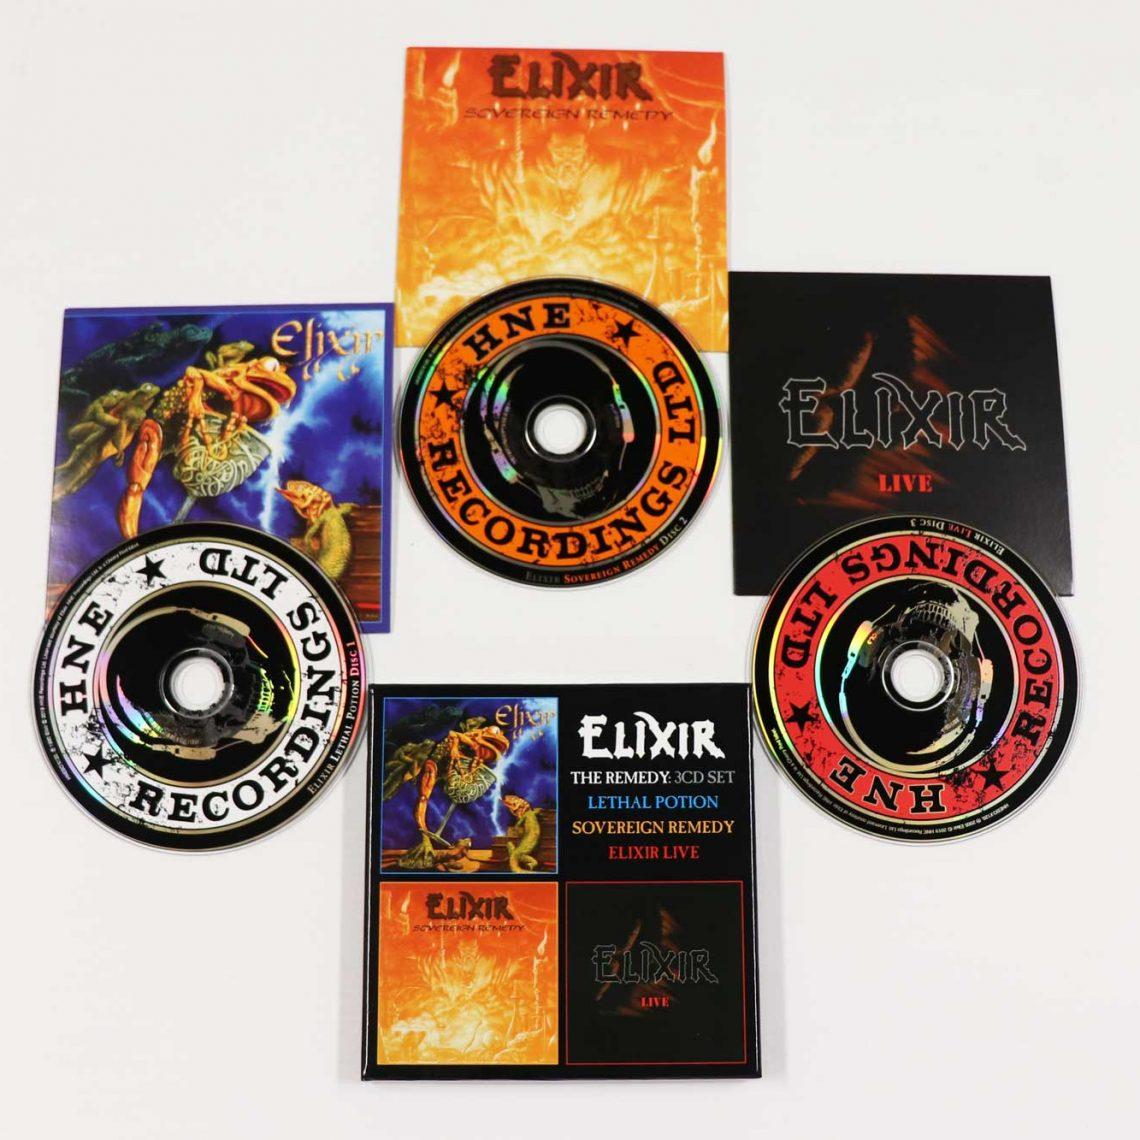 Elixir: The Remedy: Lethal Potion / Sovereign Remedy / Elixir Live, 3CD Remastered Boxset Edition